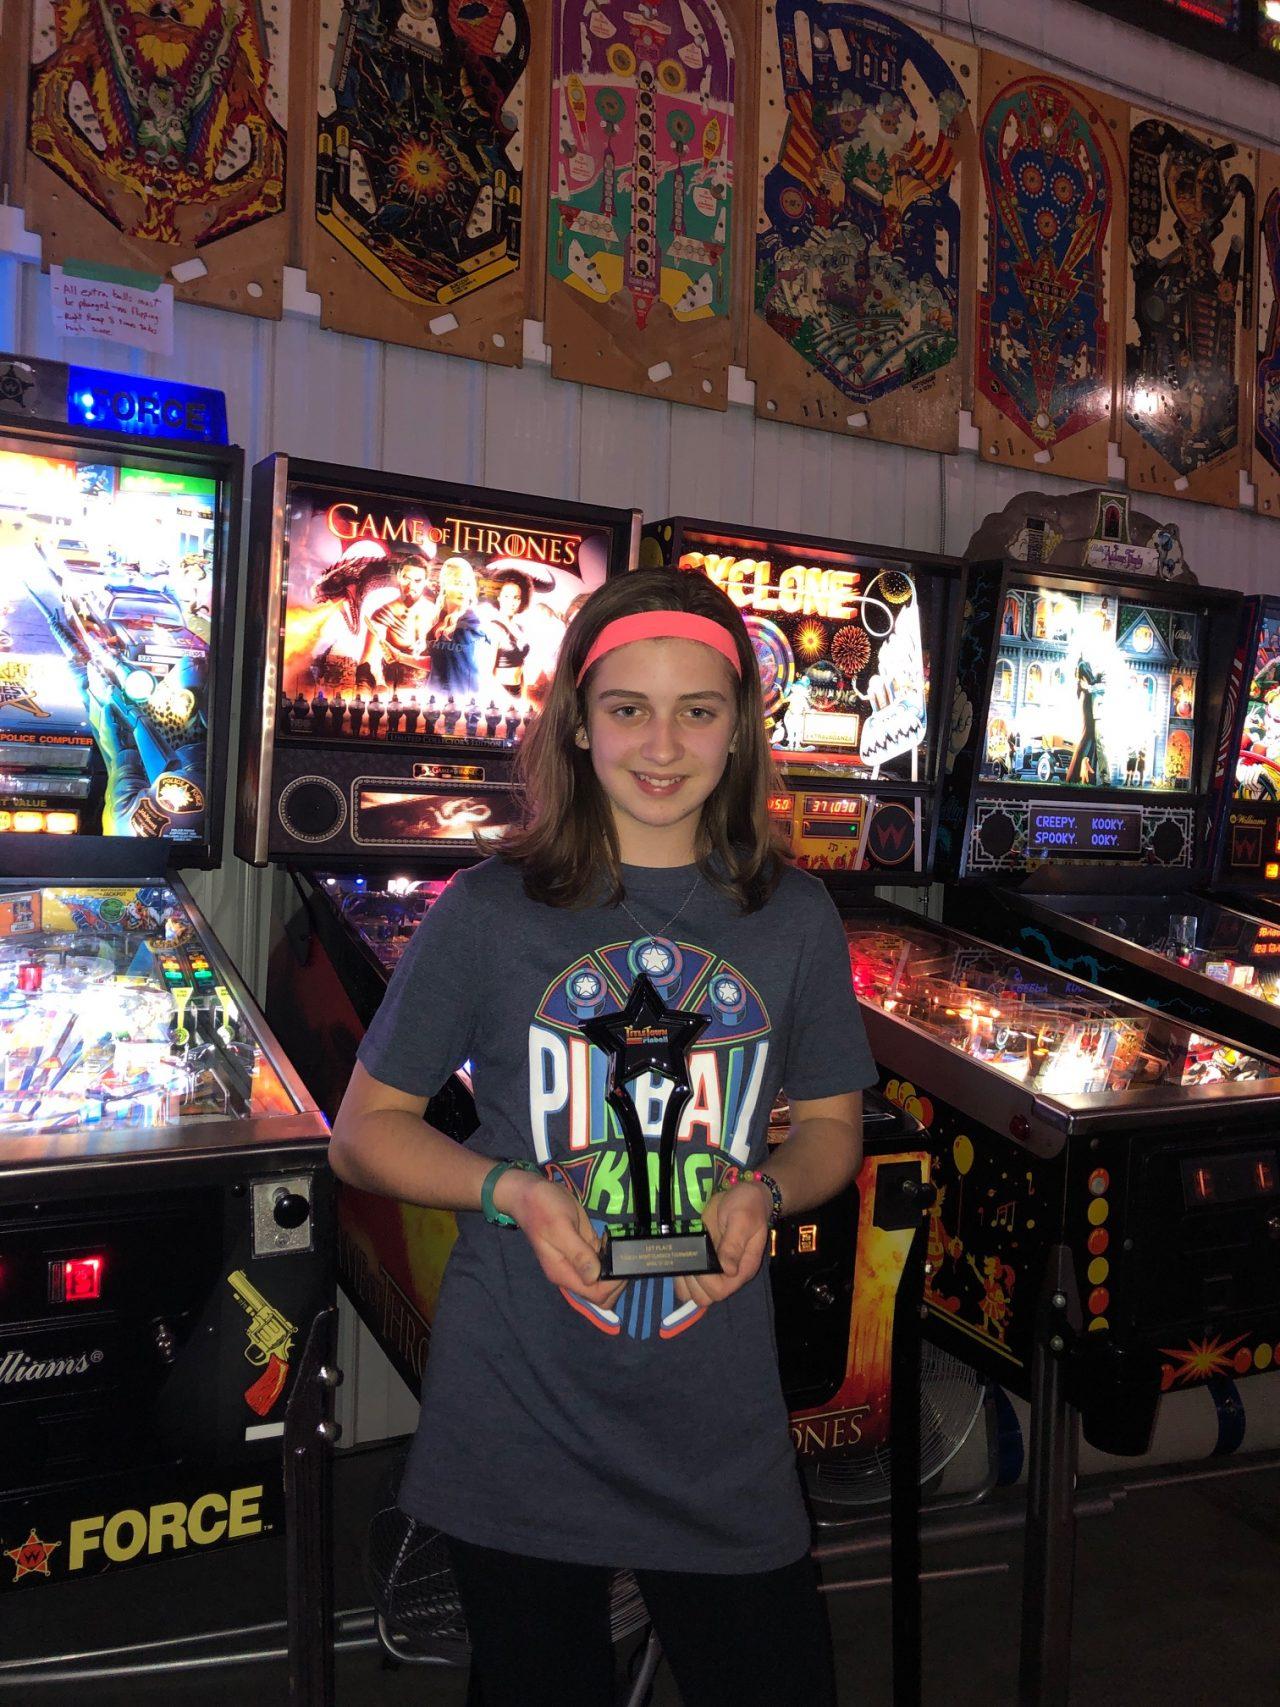 1st Place Pinball Tournament